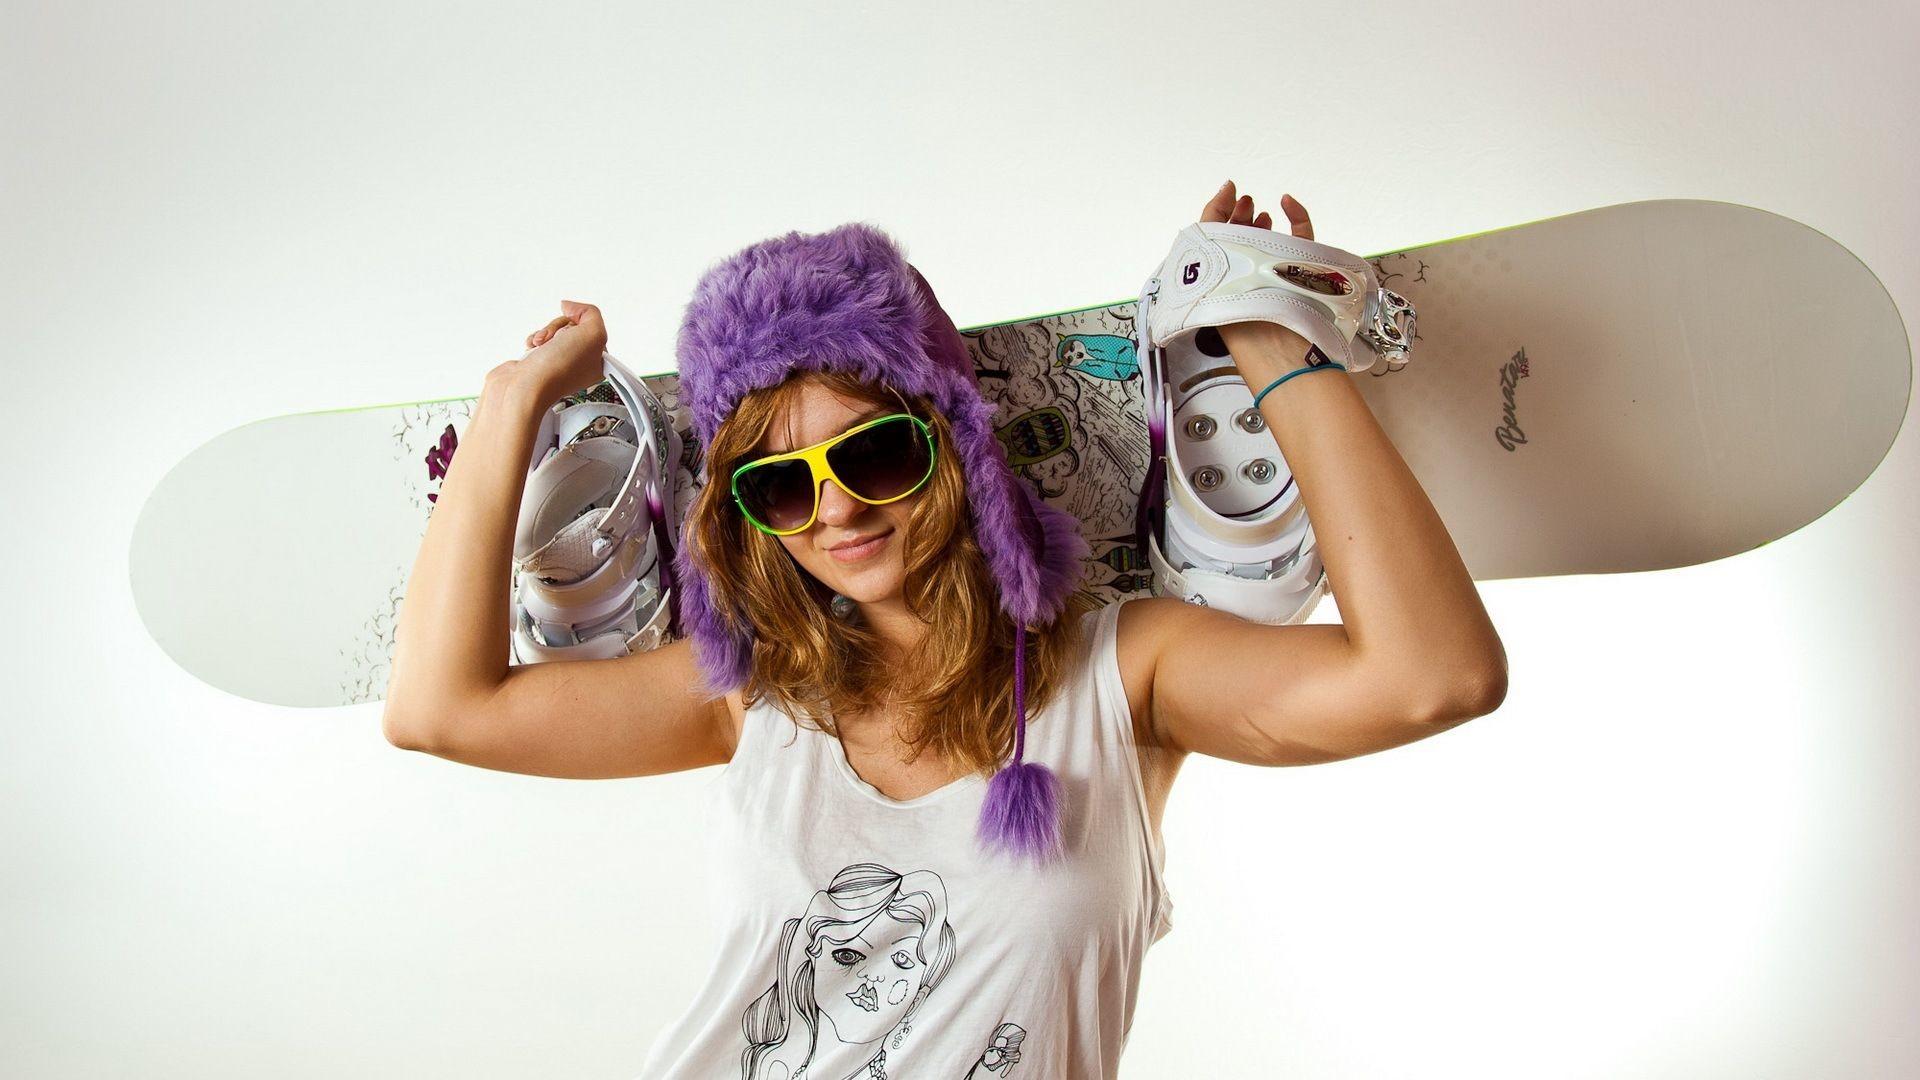 Download Wallpaper Equipment, Sports, Skateboard, Girl .